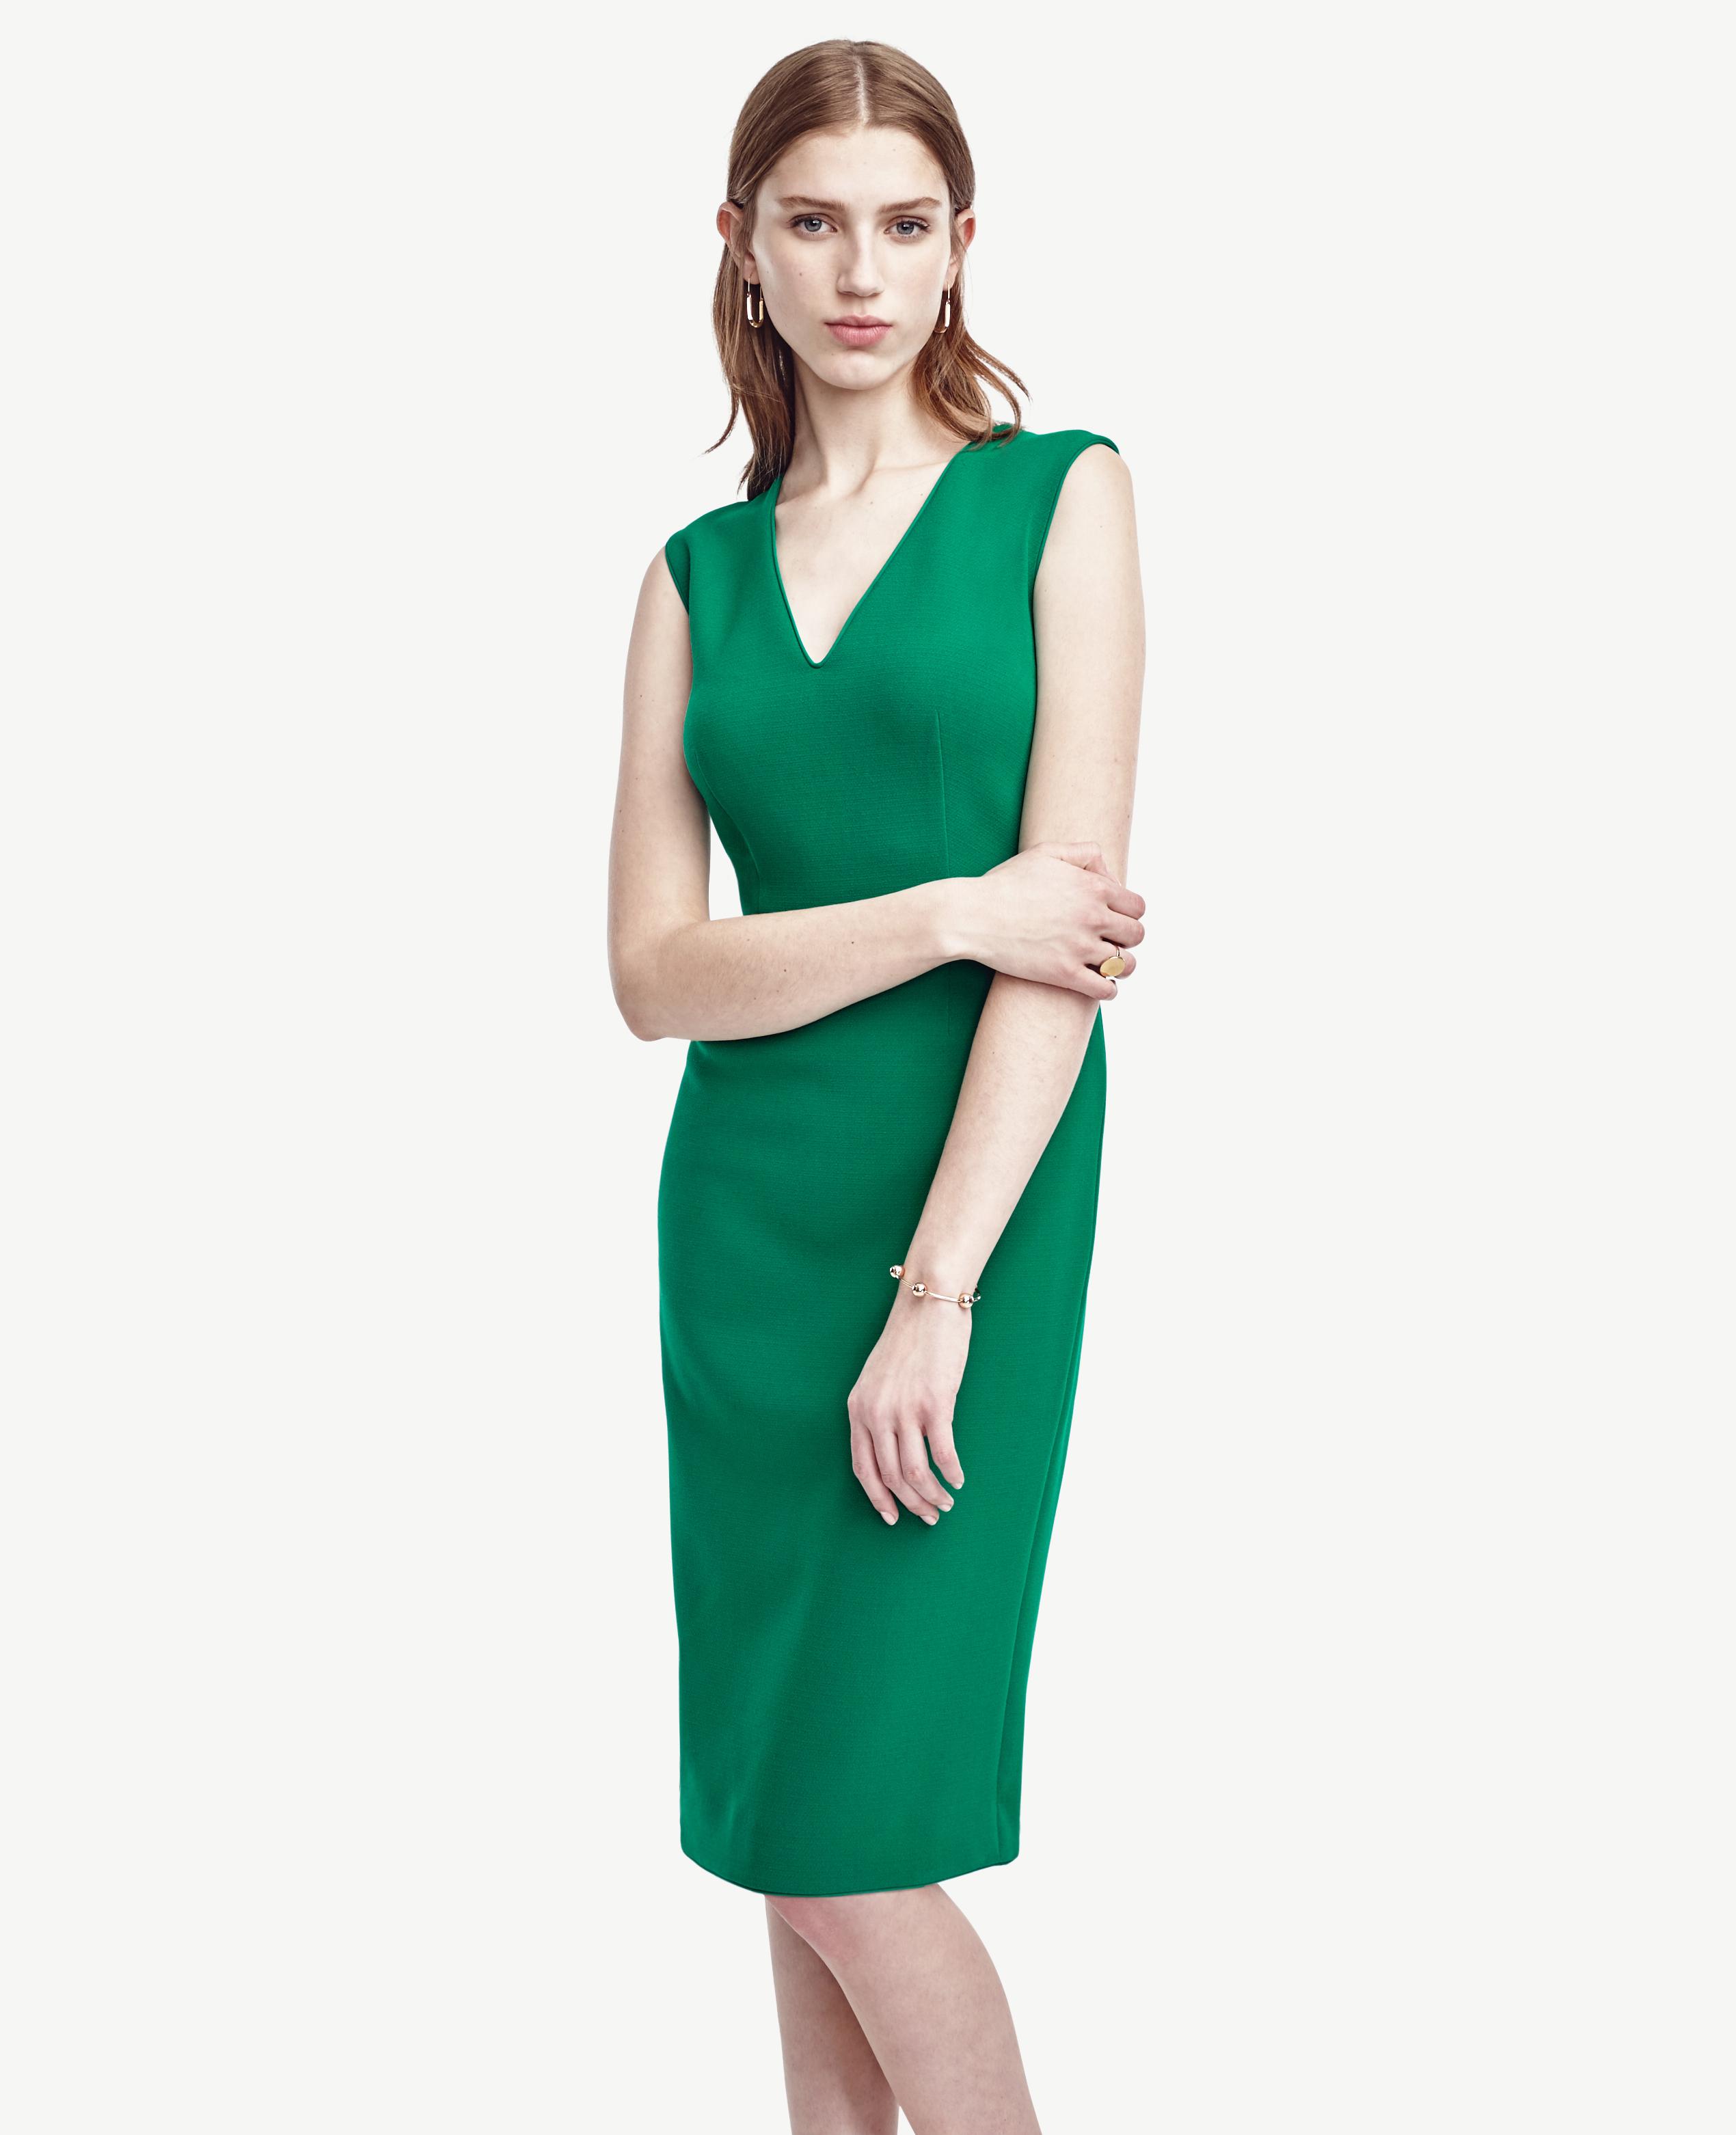 c0fc6b1461 Ann Taylor Piped Doubleweave Sheath Dress in Green - Lyst